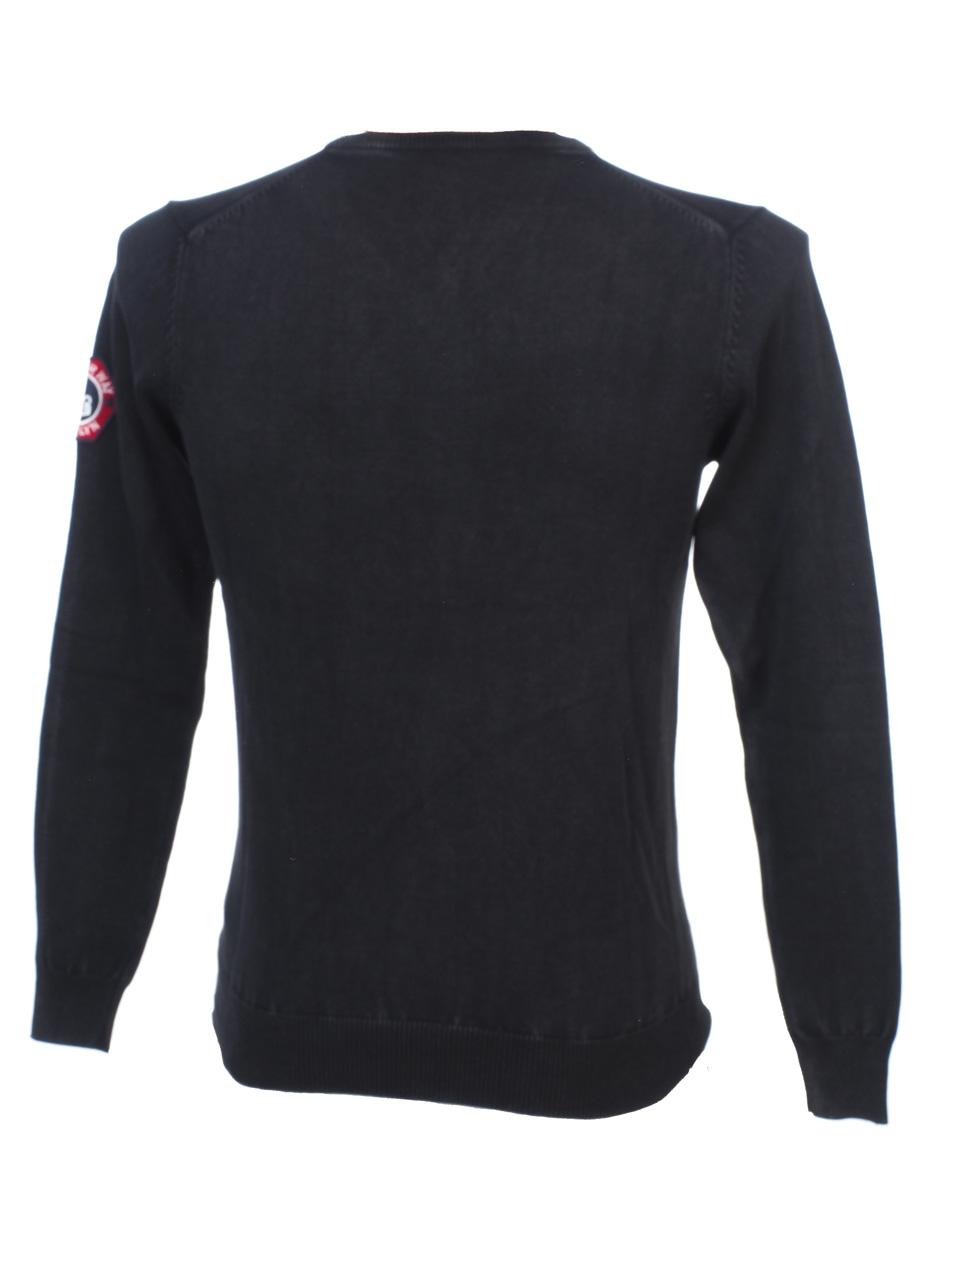 Thin-Sweater-Rivaldi-Black-Gilianu-Black-Black-Sweater-79337-New thumbnail 4